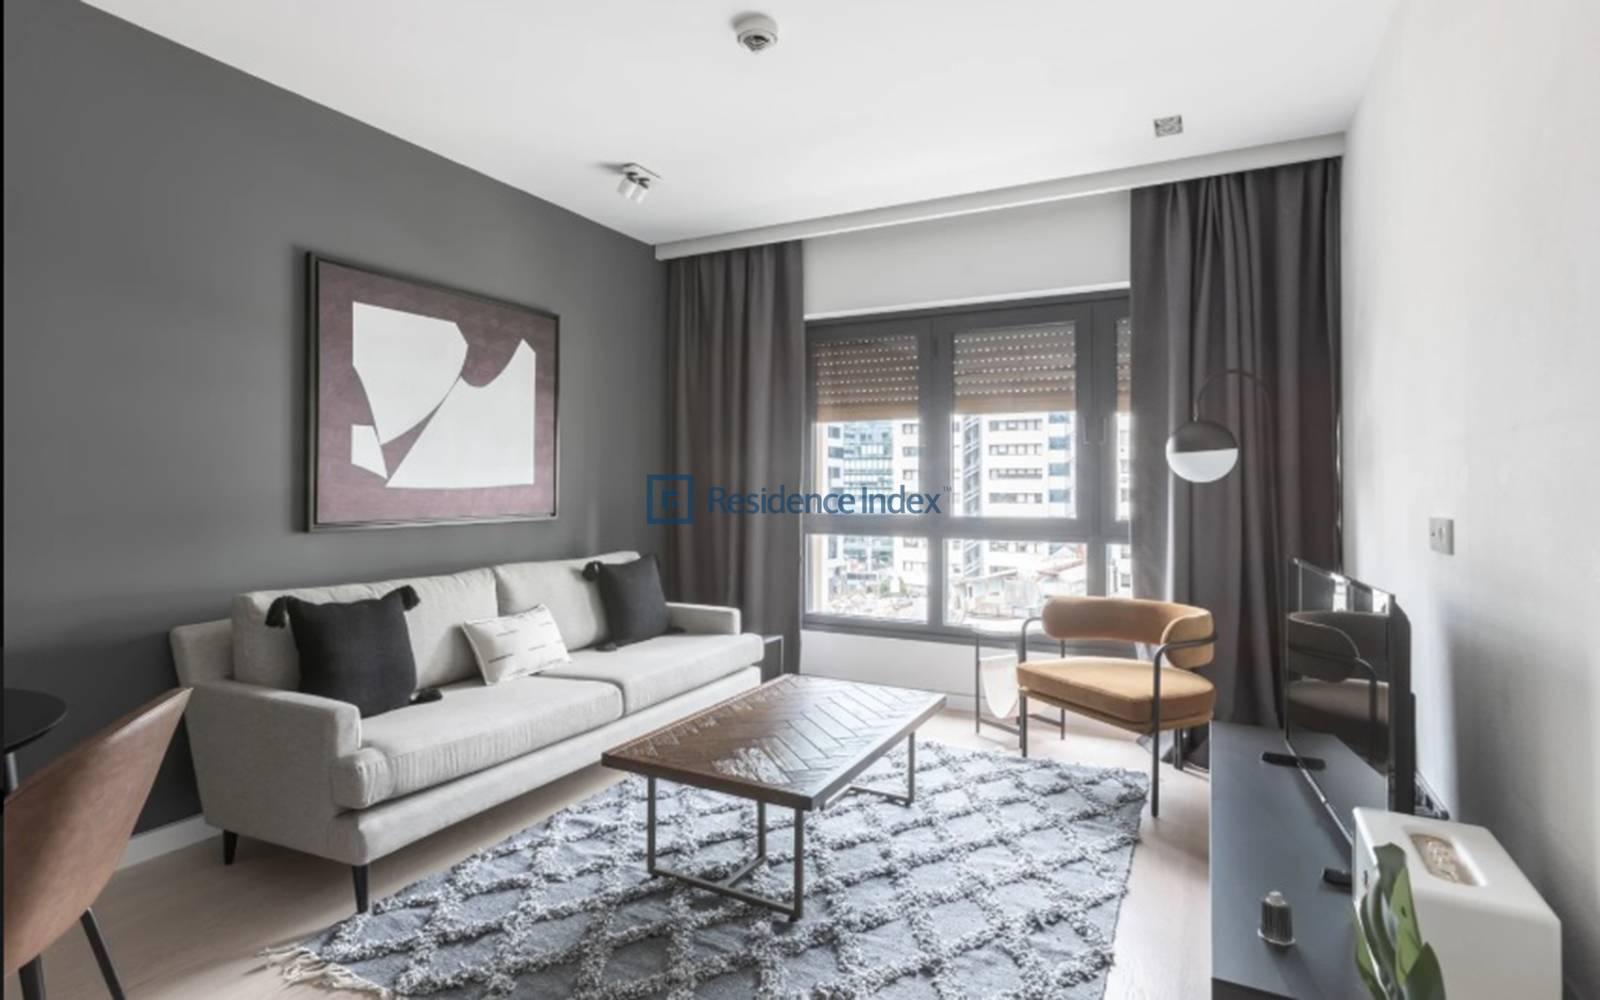 Soho Residence - 1+1 Luxury Furnished Residence For Rent